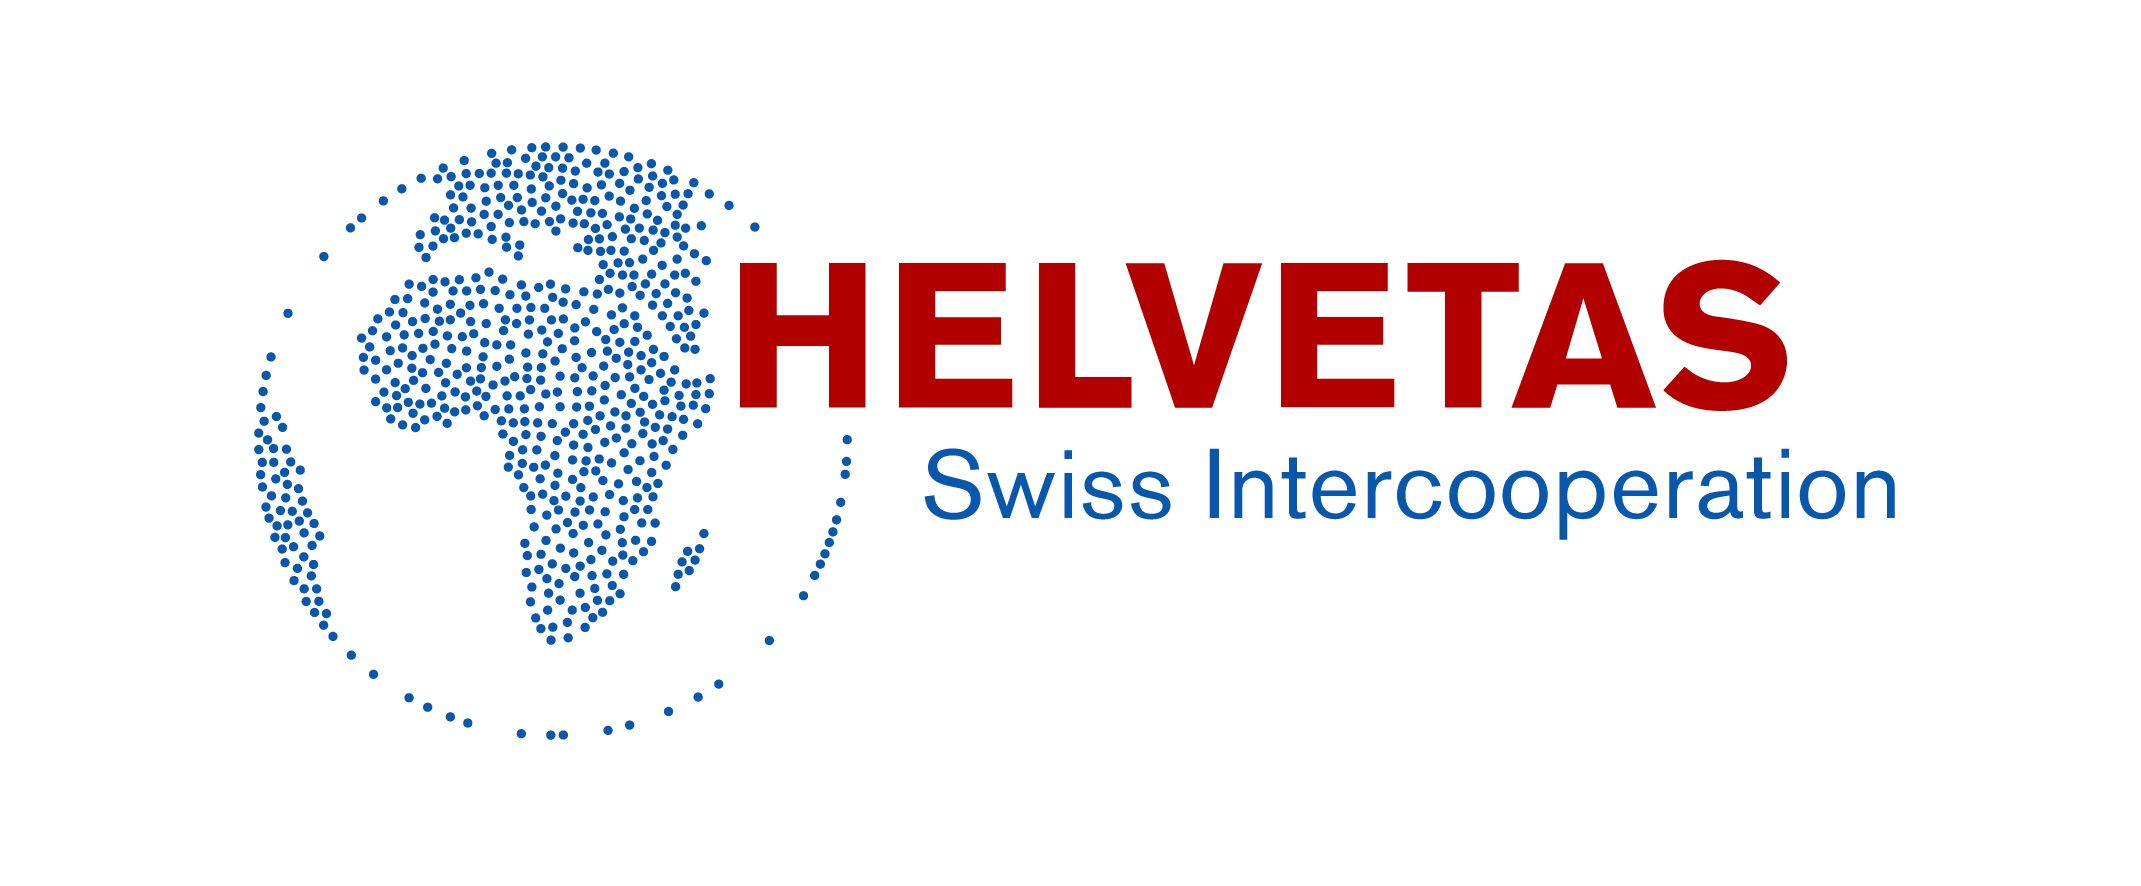 Helvetas_logo.jpg